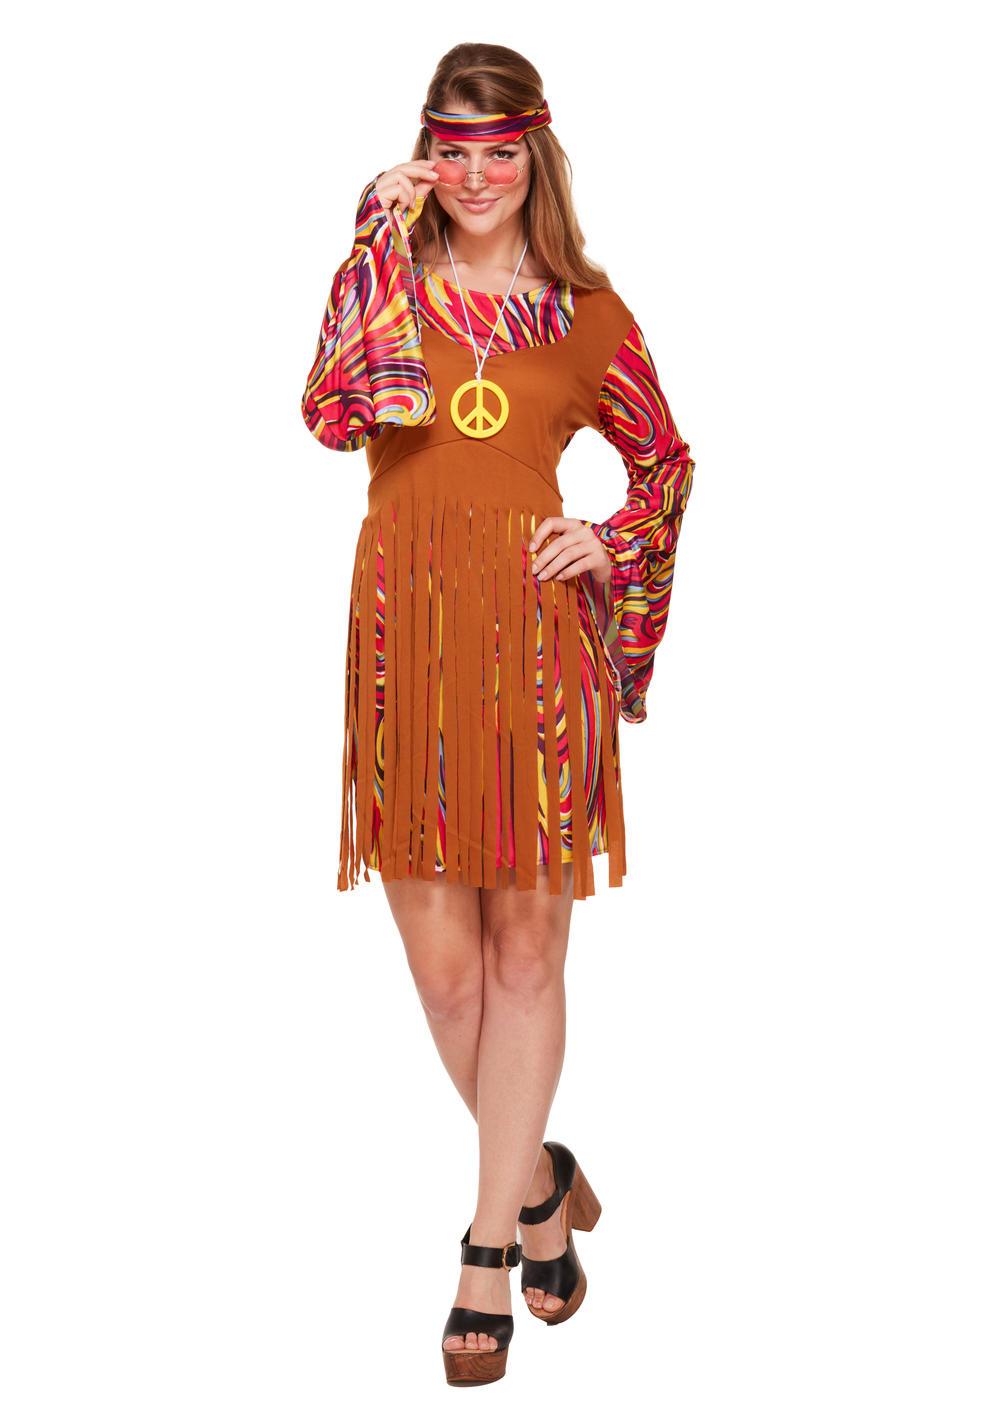 Hippie Women's Costume